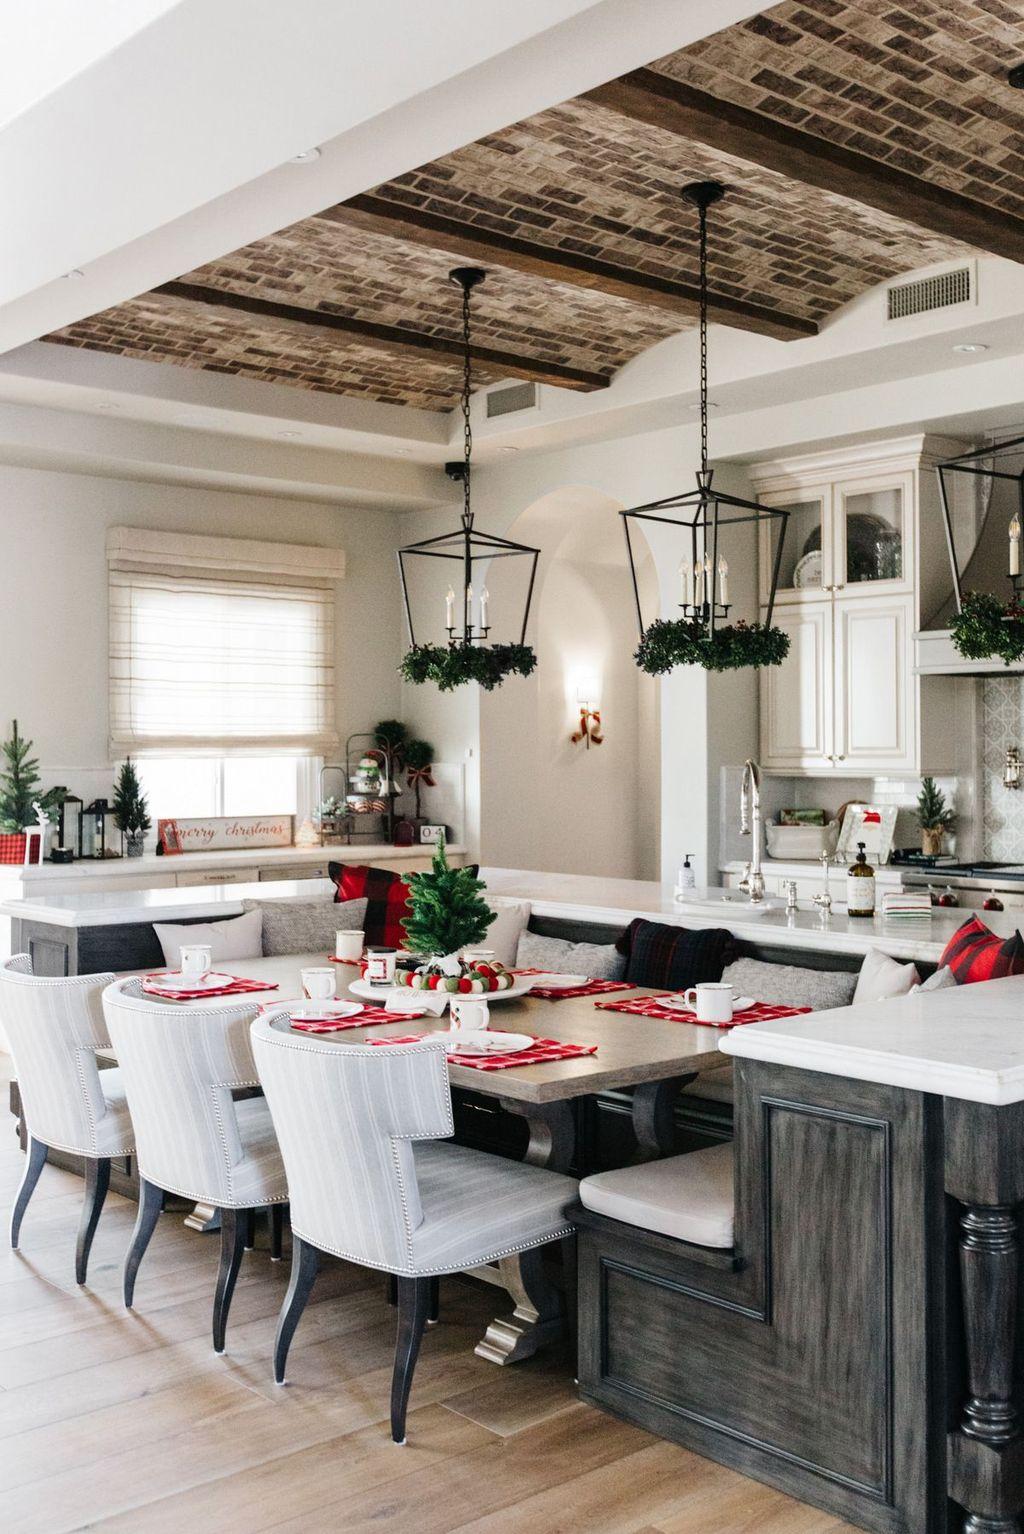 The Best Farmhouse Kitchen Decor Ideas 09